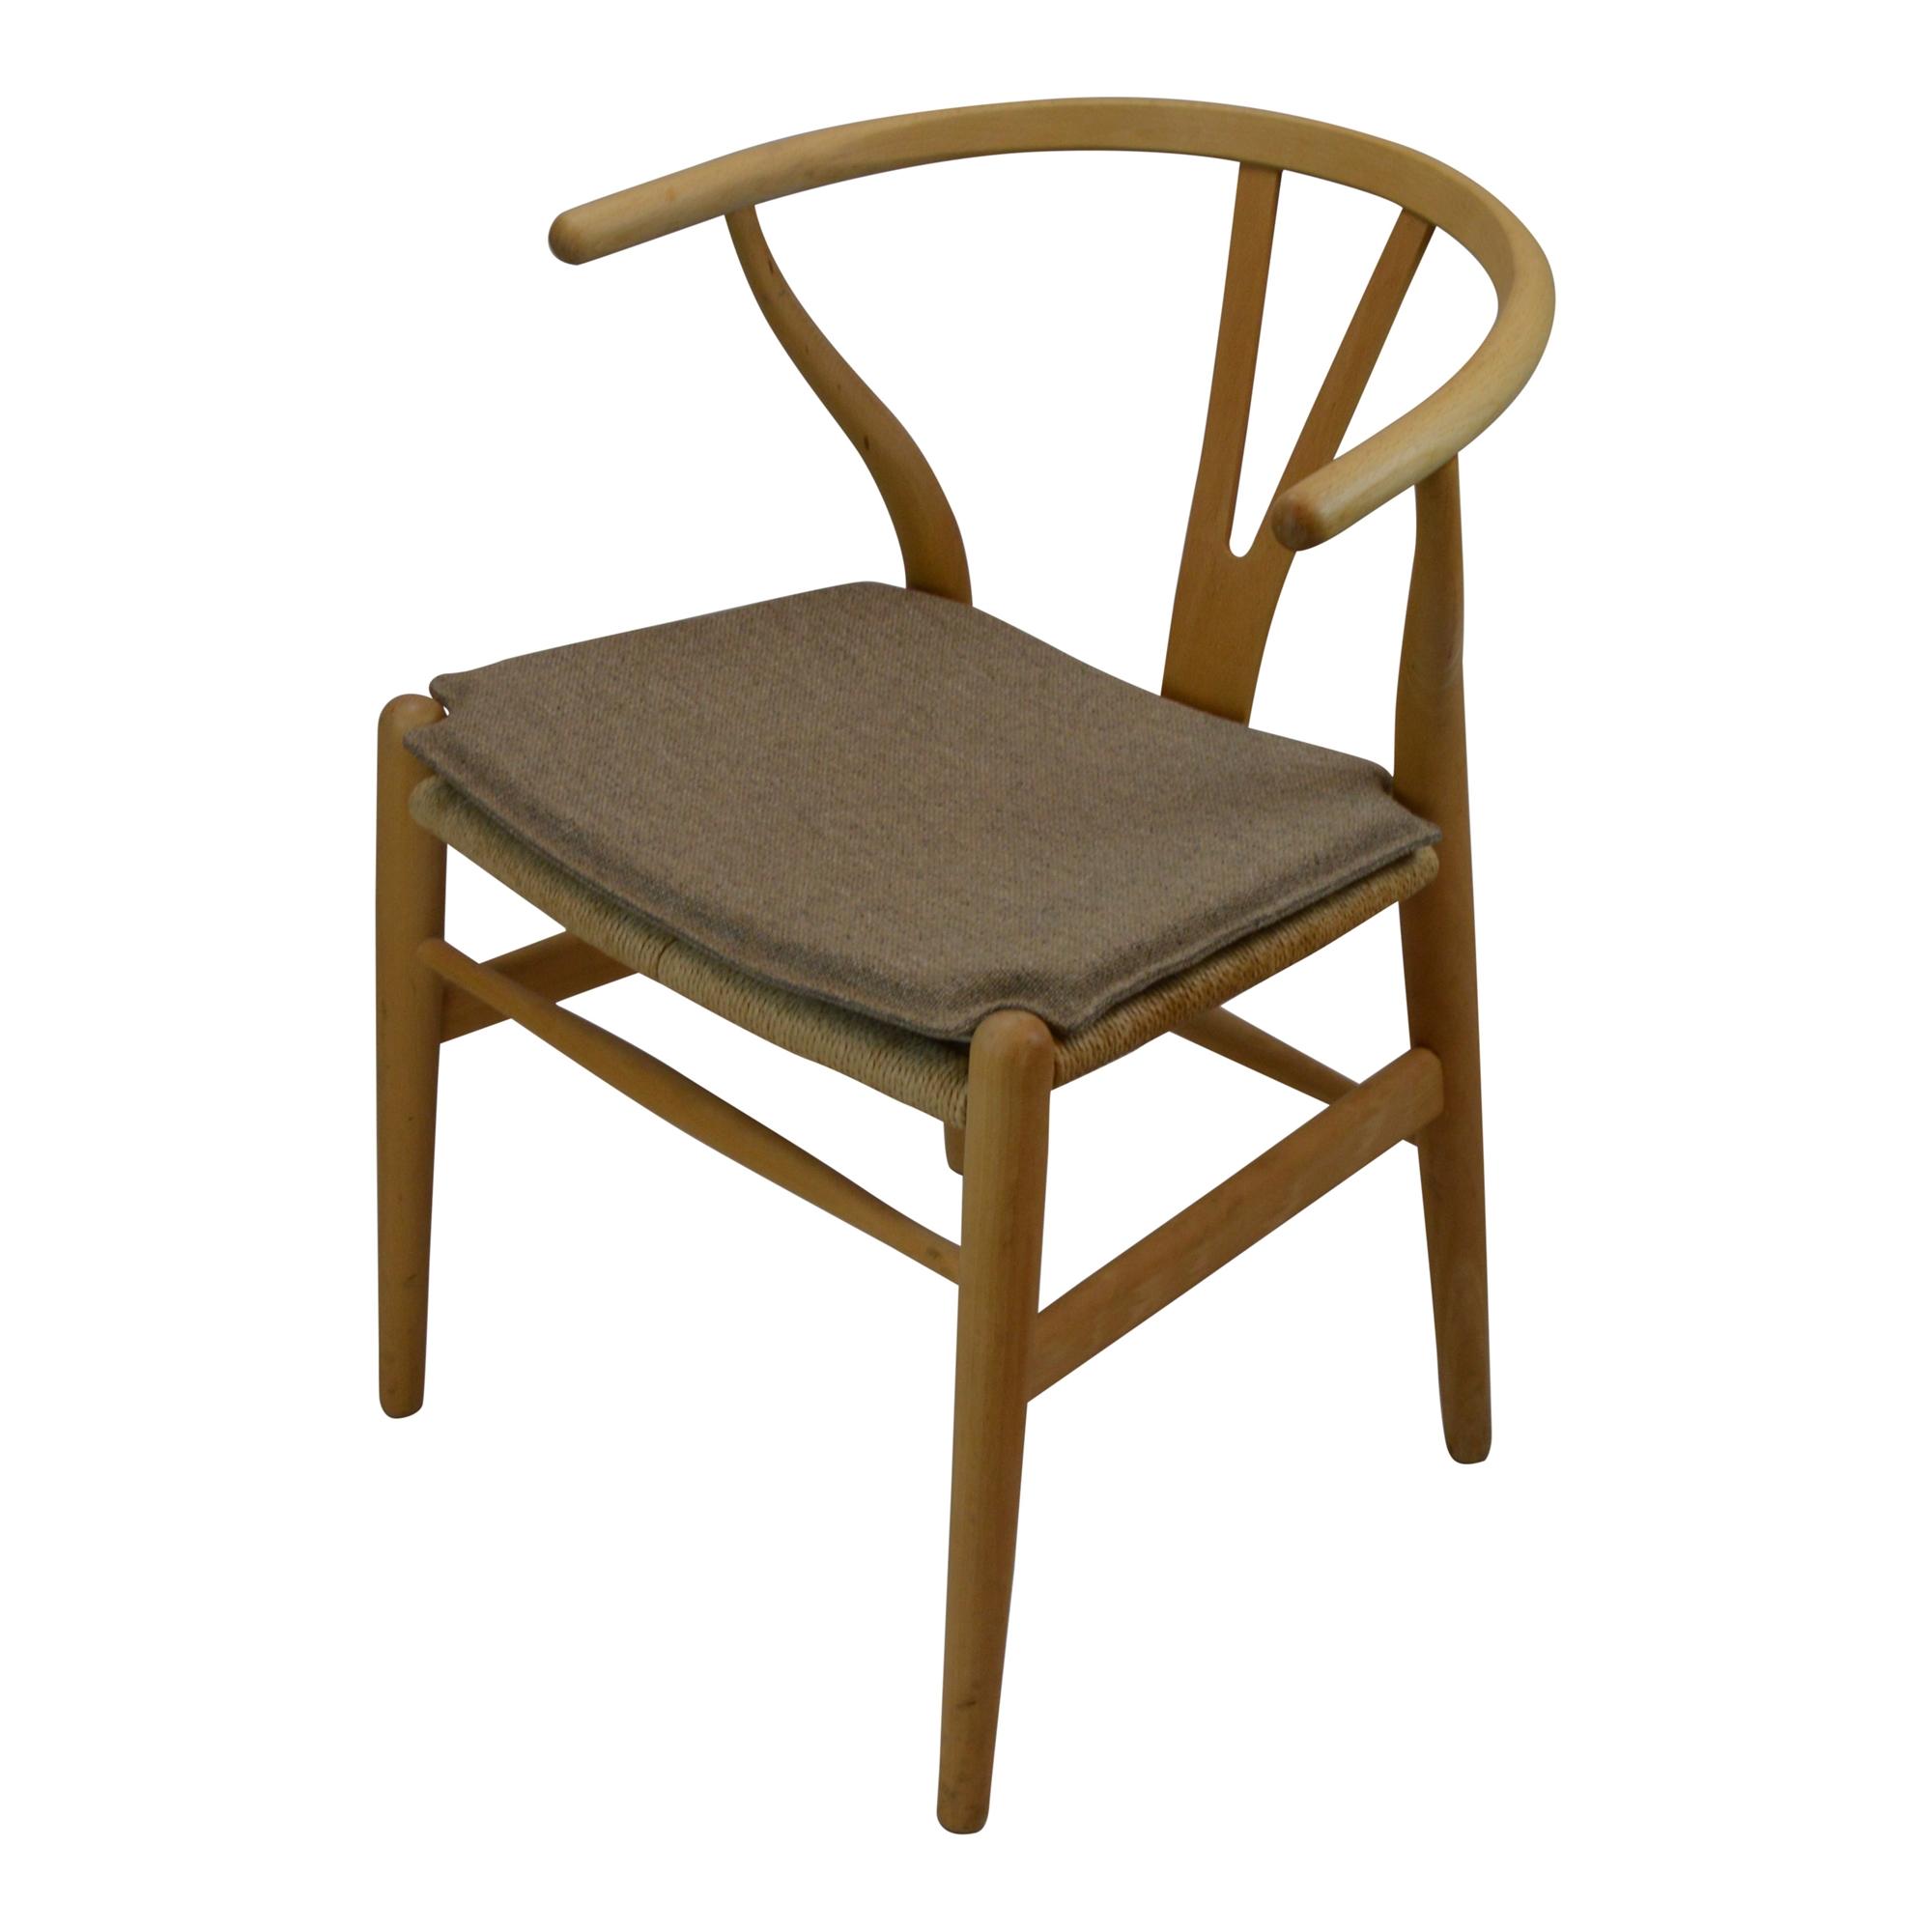 seat cushion in hallingdal fabric for ch 24 wishbone chair